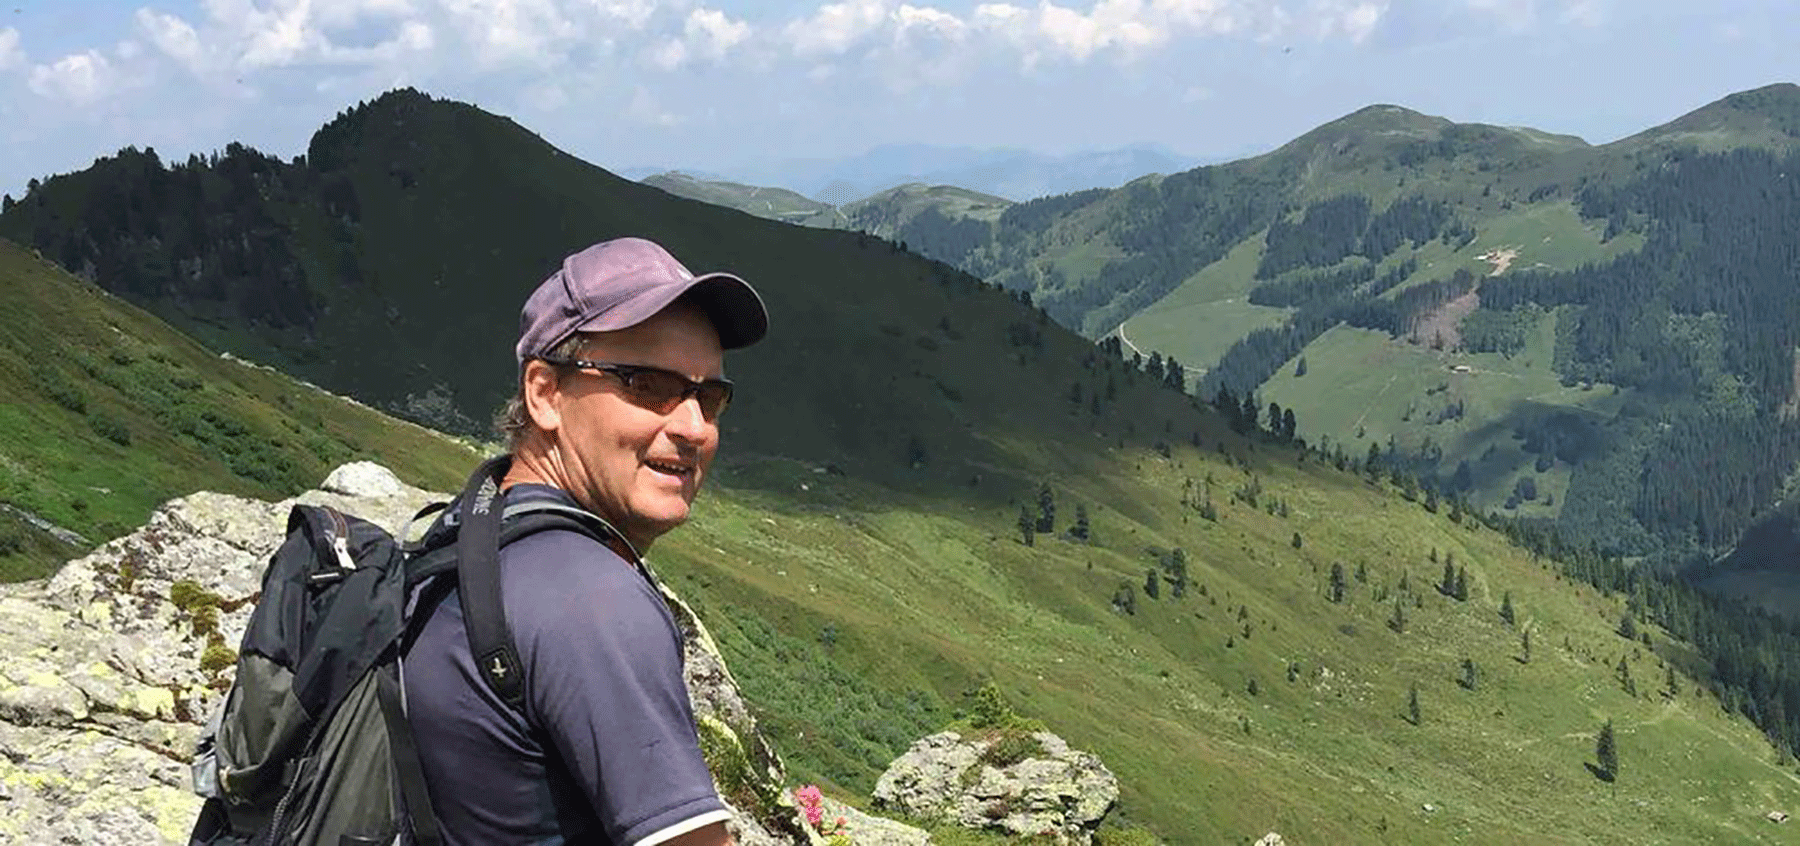 Wanderführer Tom vom Alpbacherhof Aktivurlaub Alpbachtal